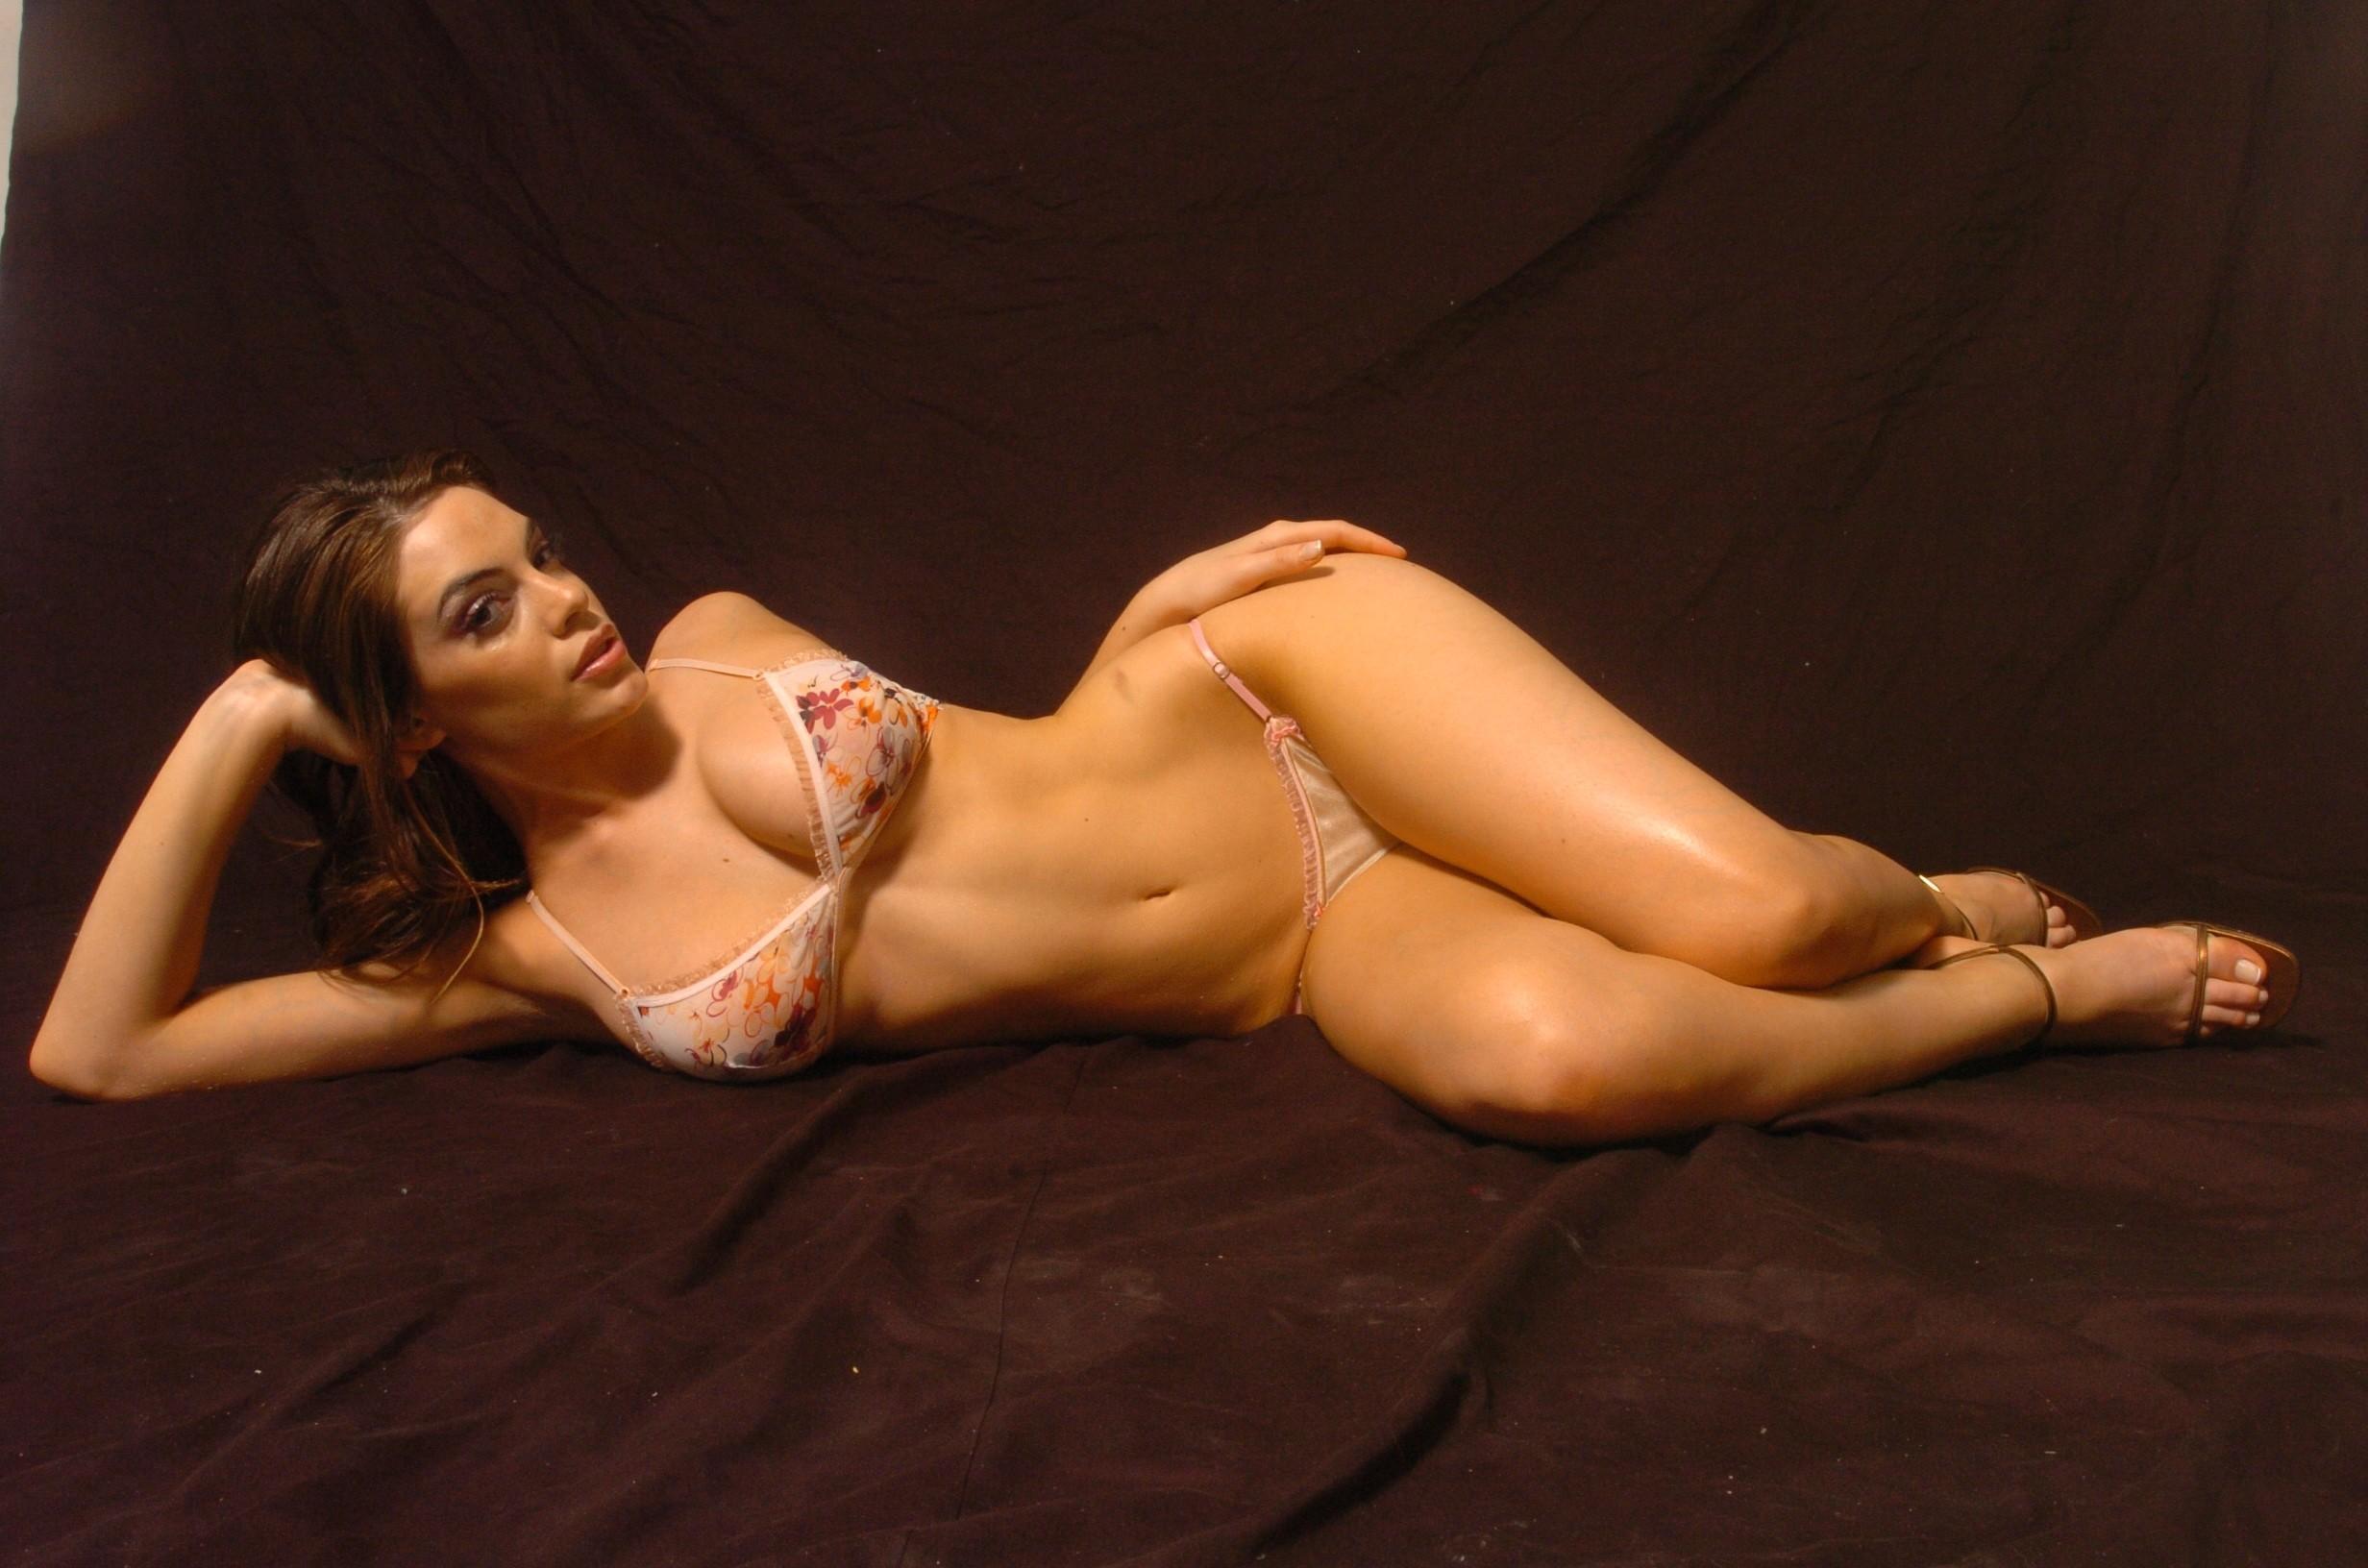 Emilia Attias En Topless Espectacular Modelo Argentina